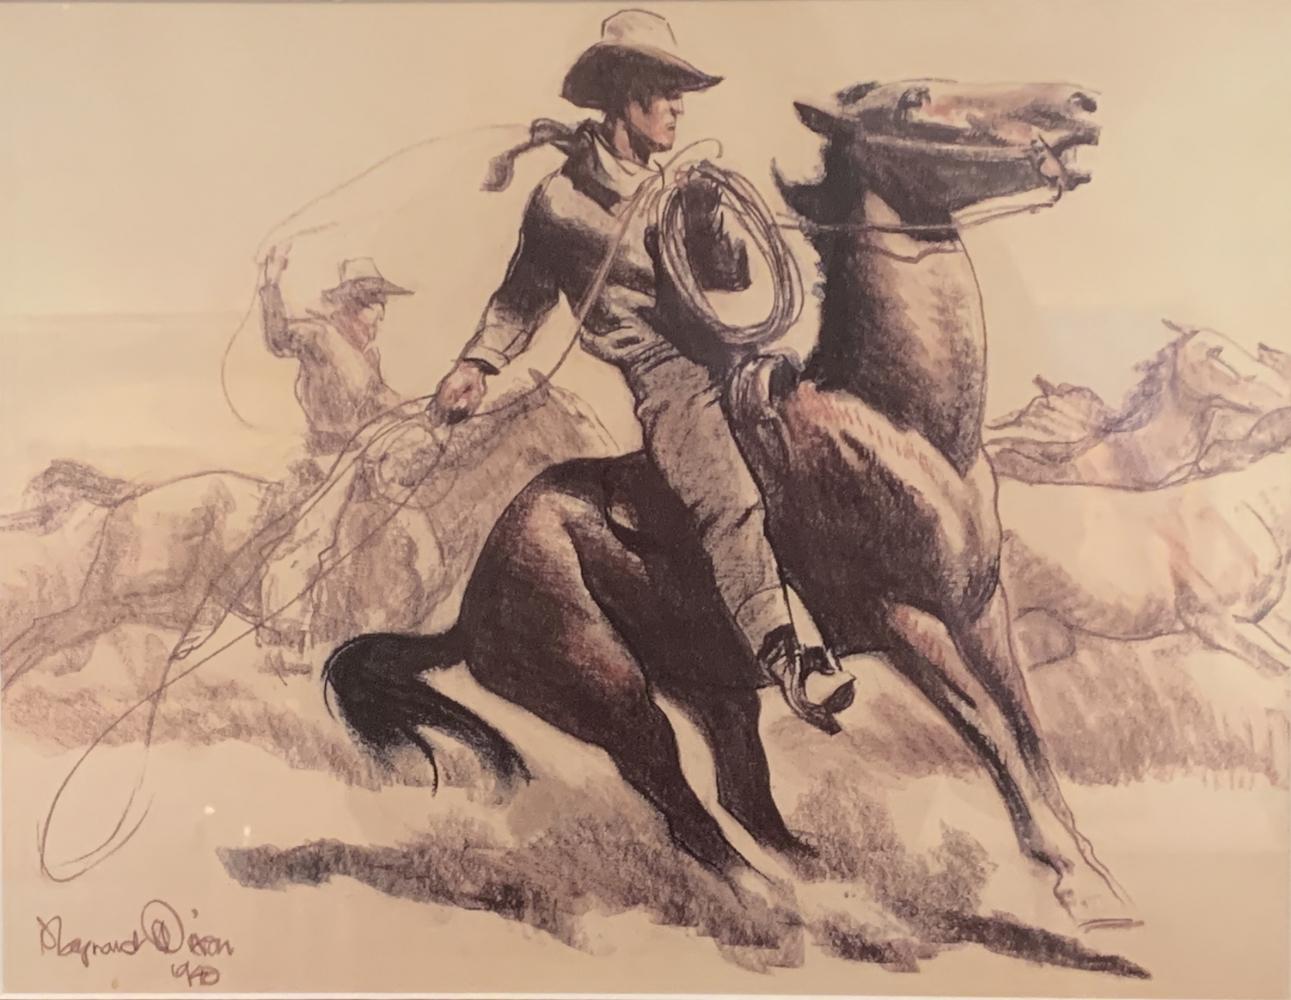 Maynard Dixon, american west, historical art